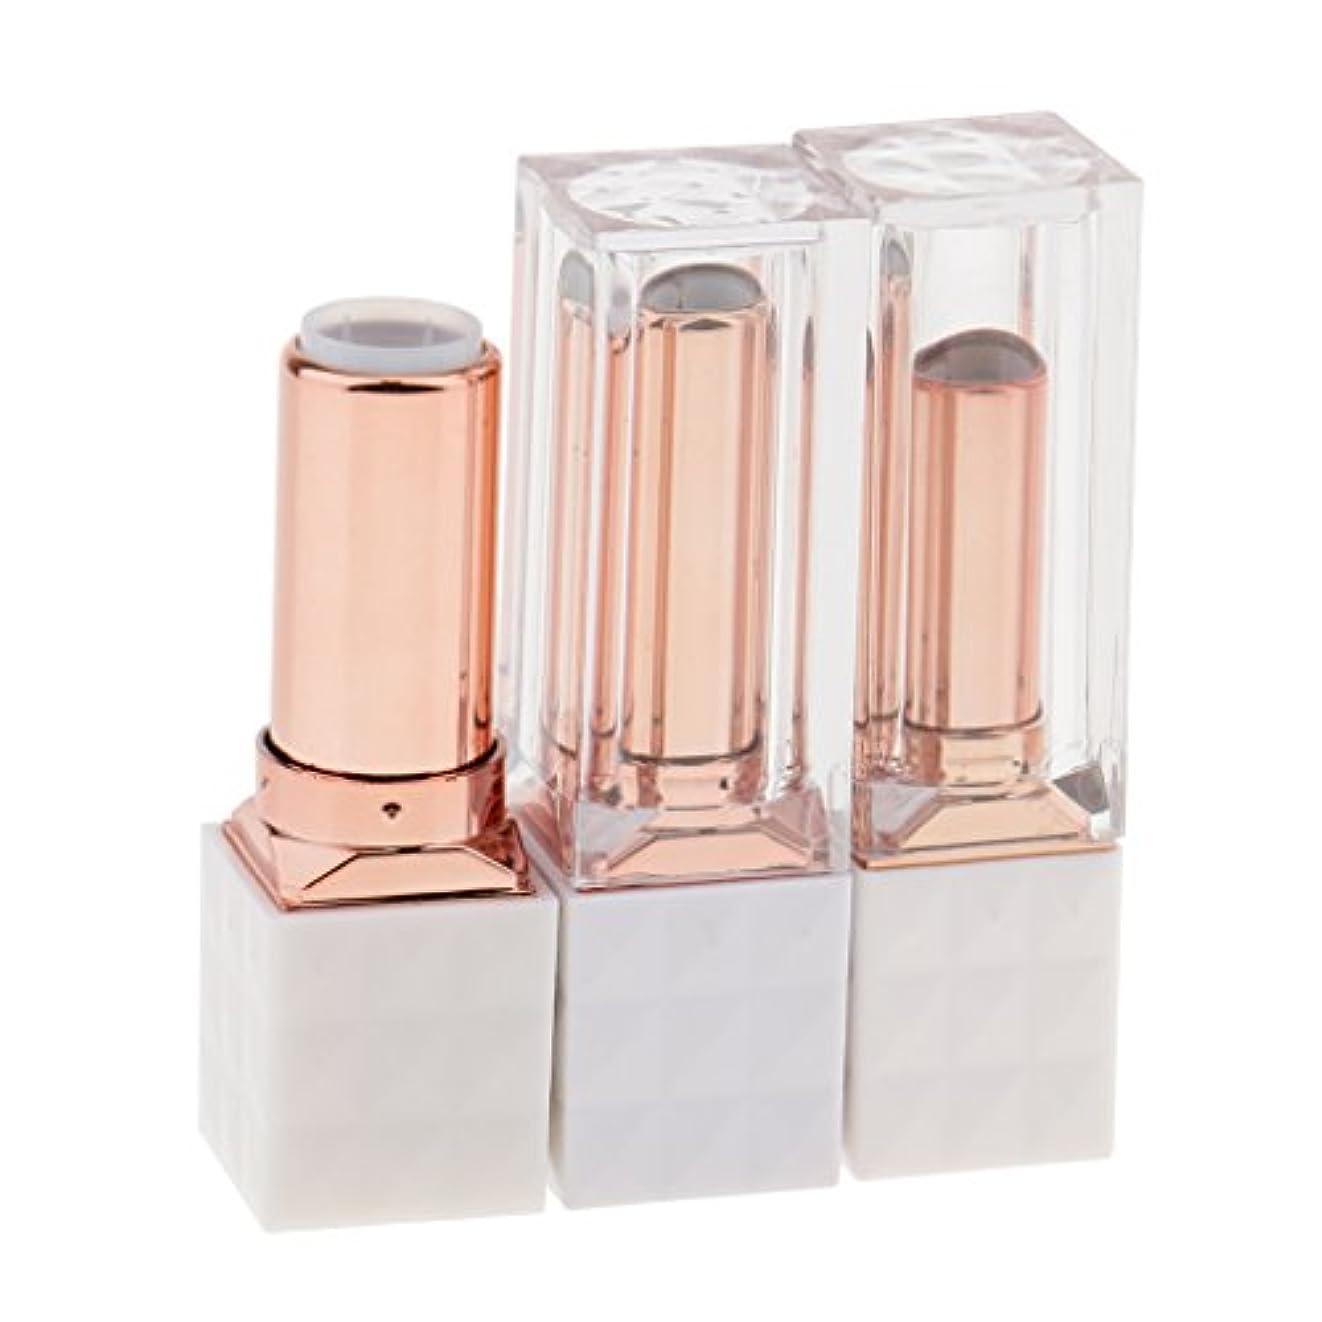 KOZEEY 3個 空チューブ リップバーム リップスティック コンディー 化粧品 コスメ 口紅 DIY 手作り プレゼント